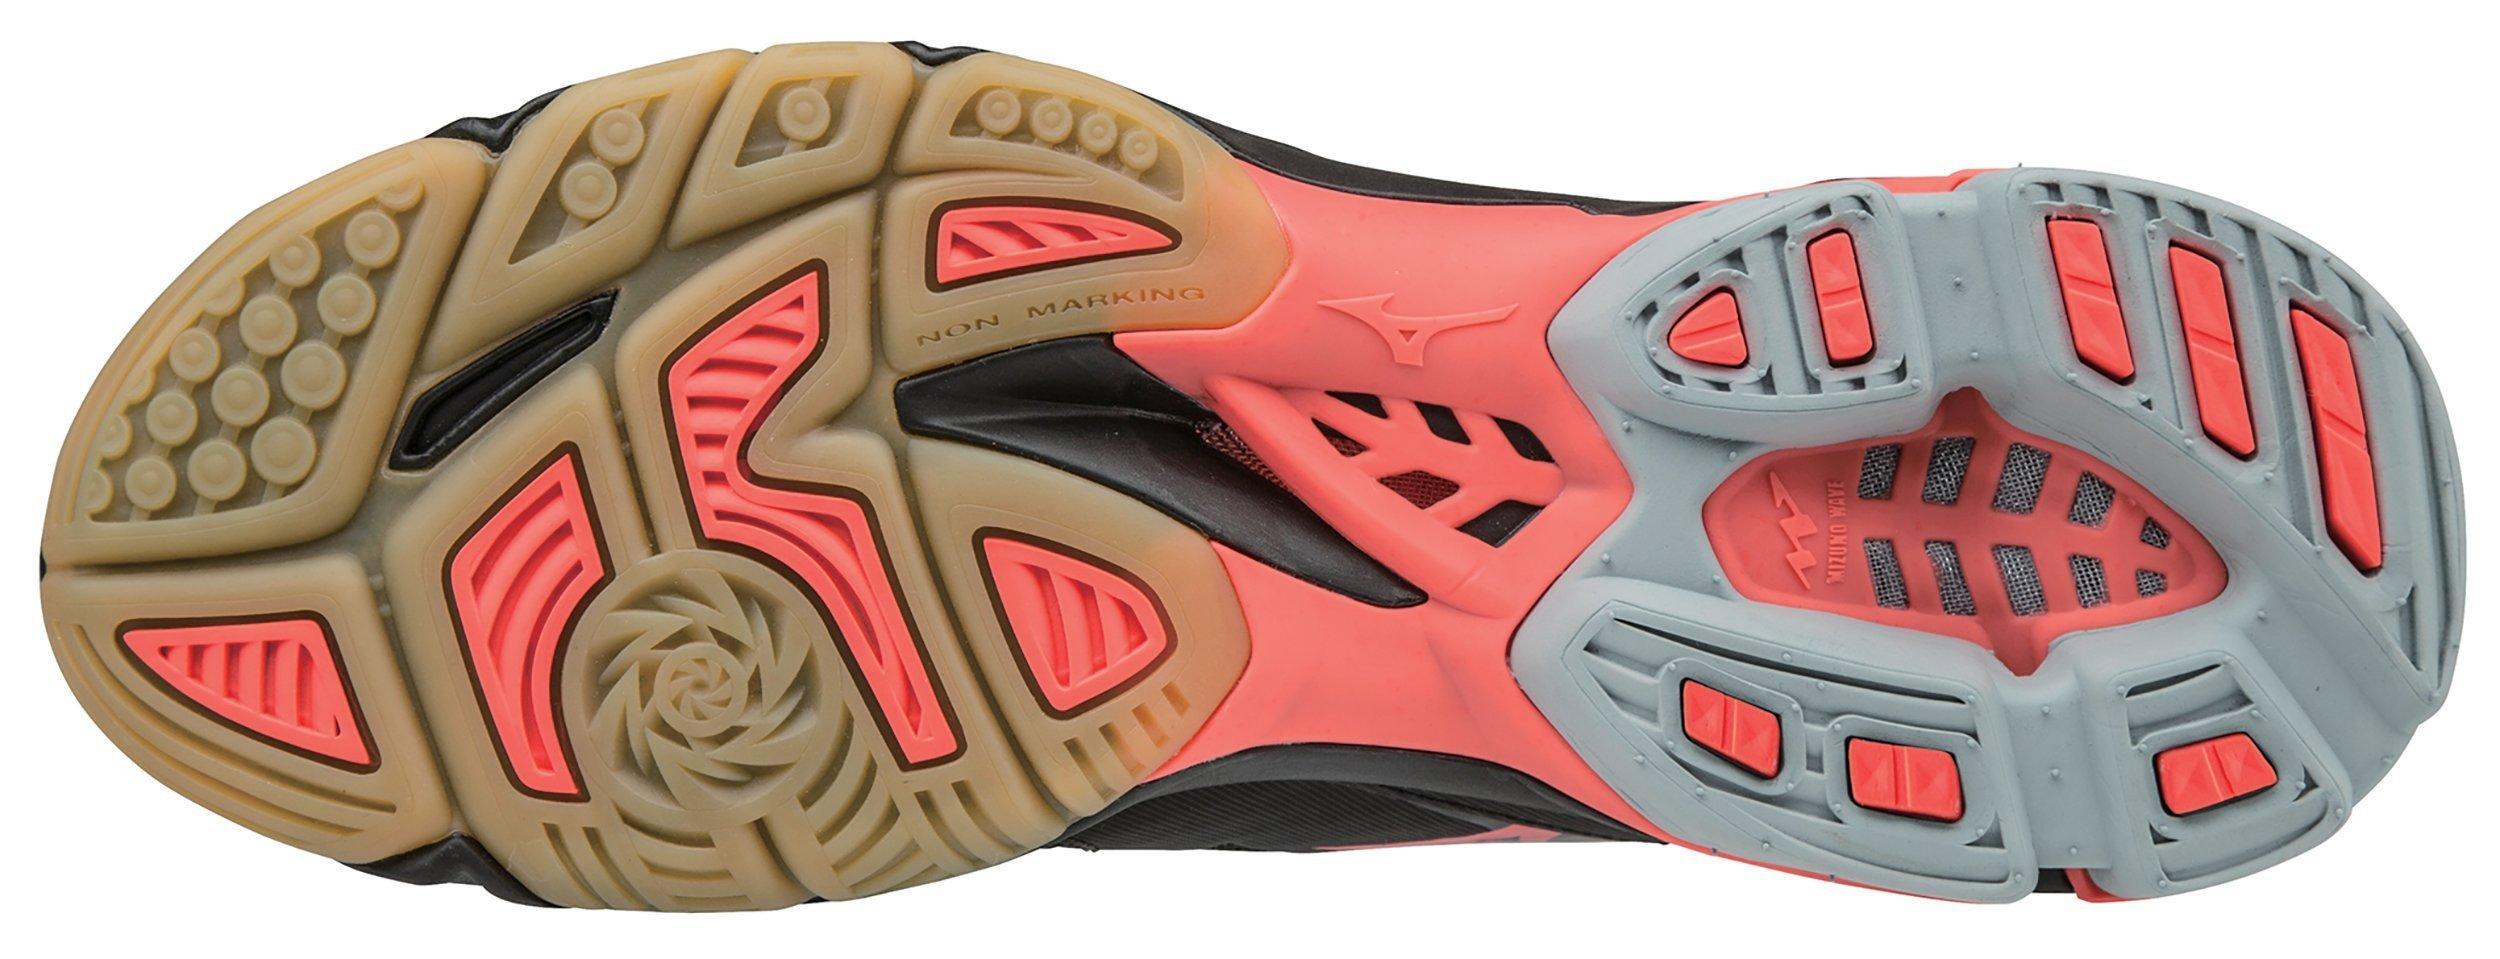 Mizuno Women's Wave Lightning Z3 Volleyball Shoes (Black, 12.0)